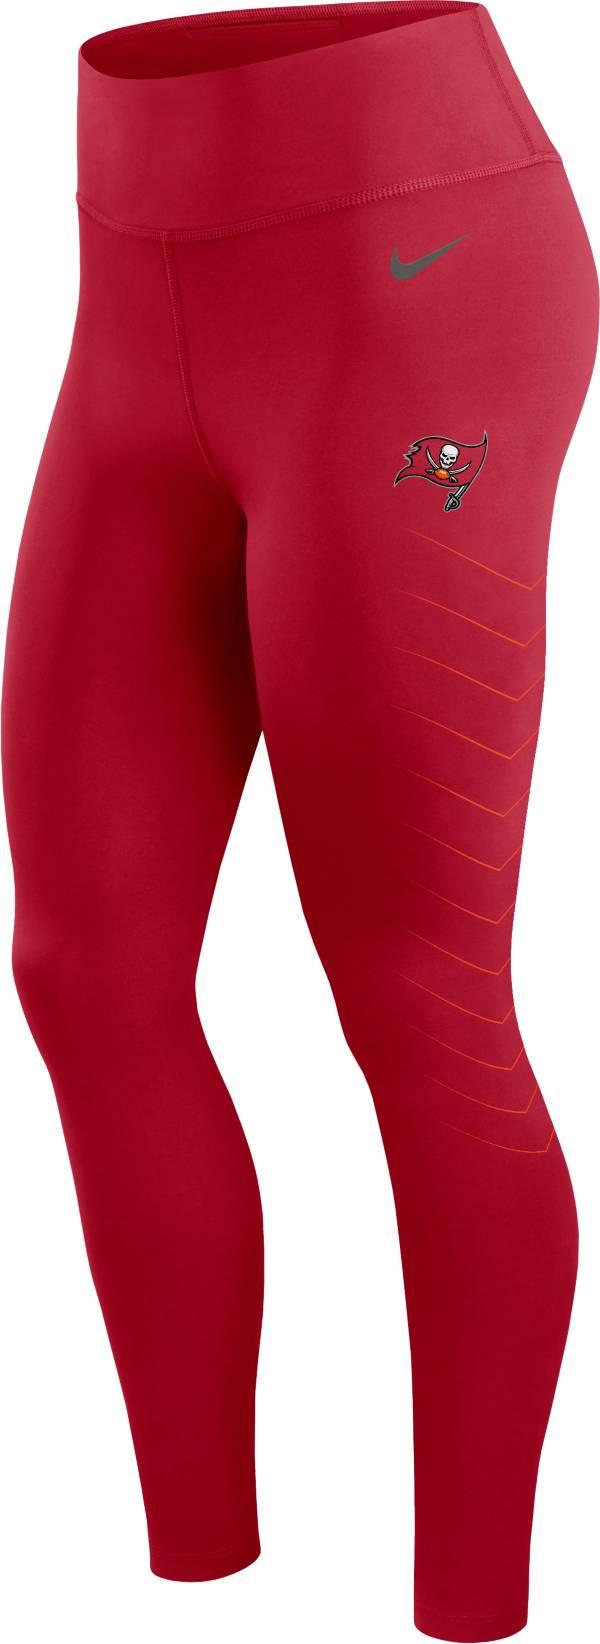 Nike Women's Tampa Bay Buccaneers Dri-FIT Red Performance Leggings product image